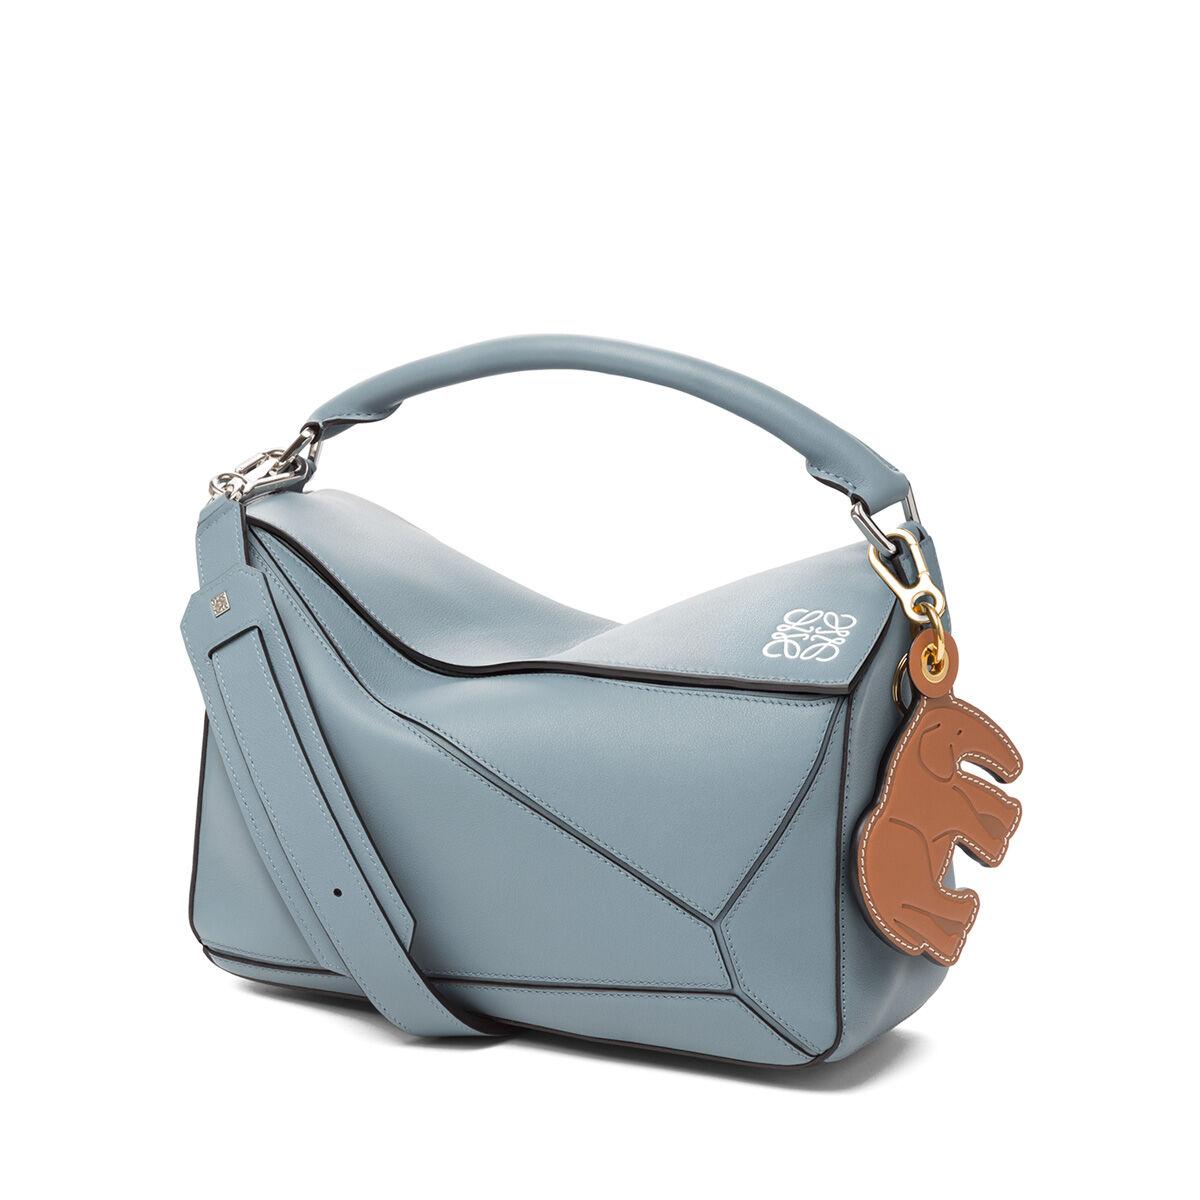 LOEWE Elephant Leather Charm Tan/Navy Blue all